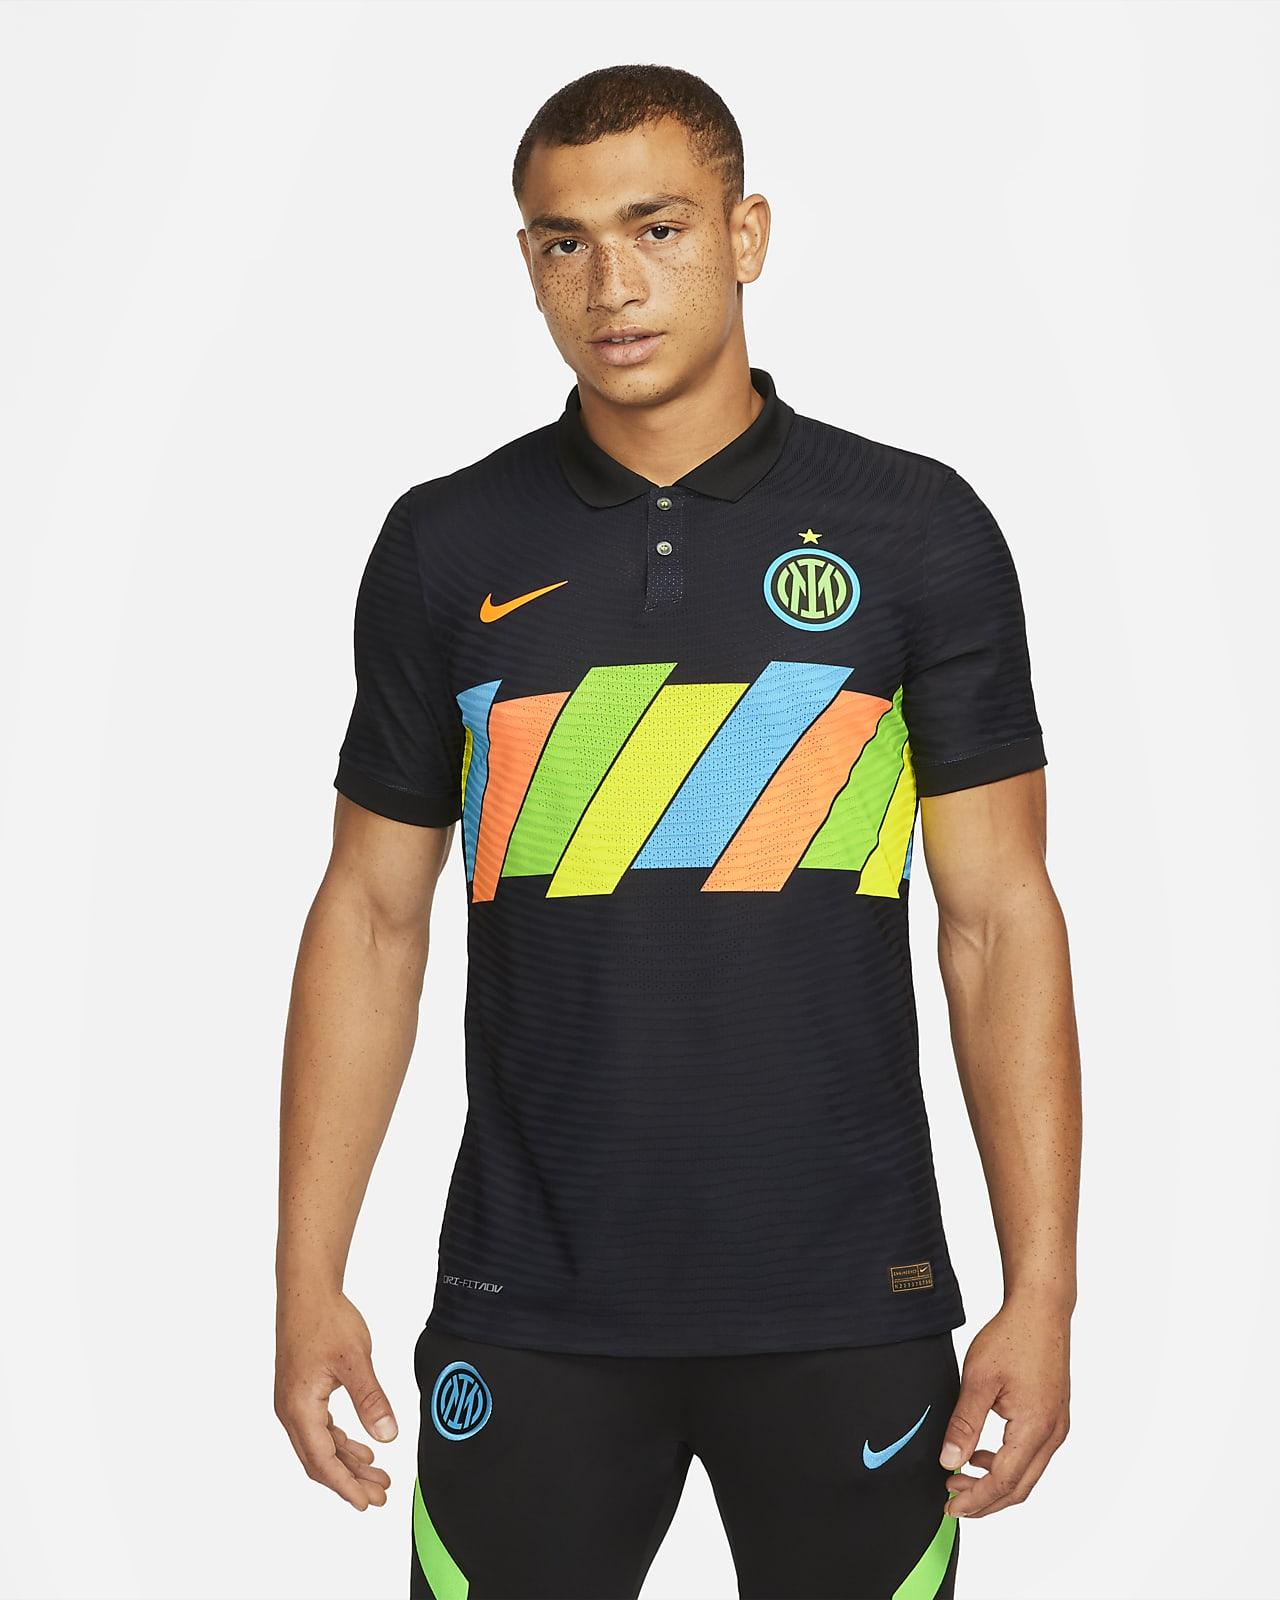 Inter Milan 2021/22 Match Men's Nike Dri-FIT ADV Football Shirt